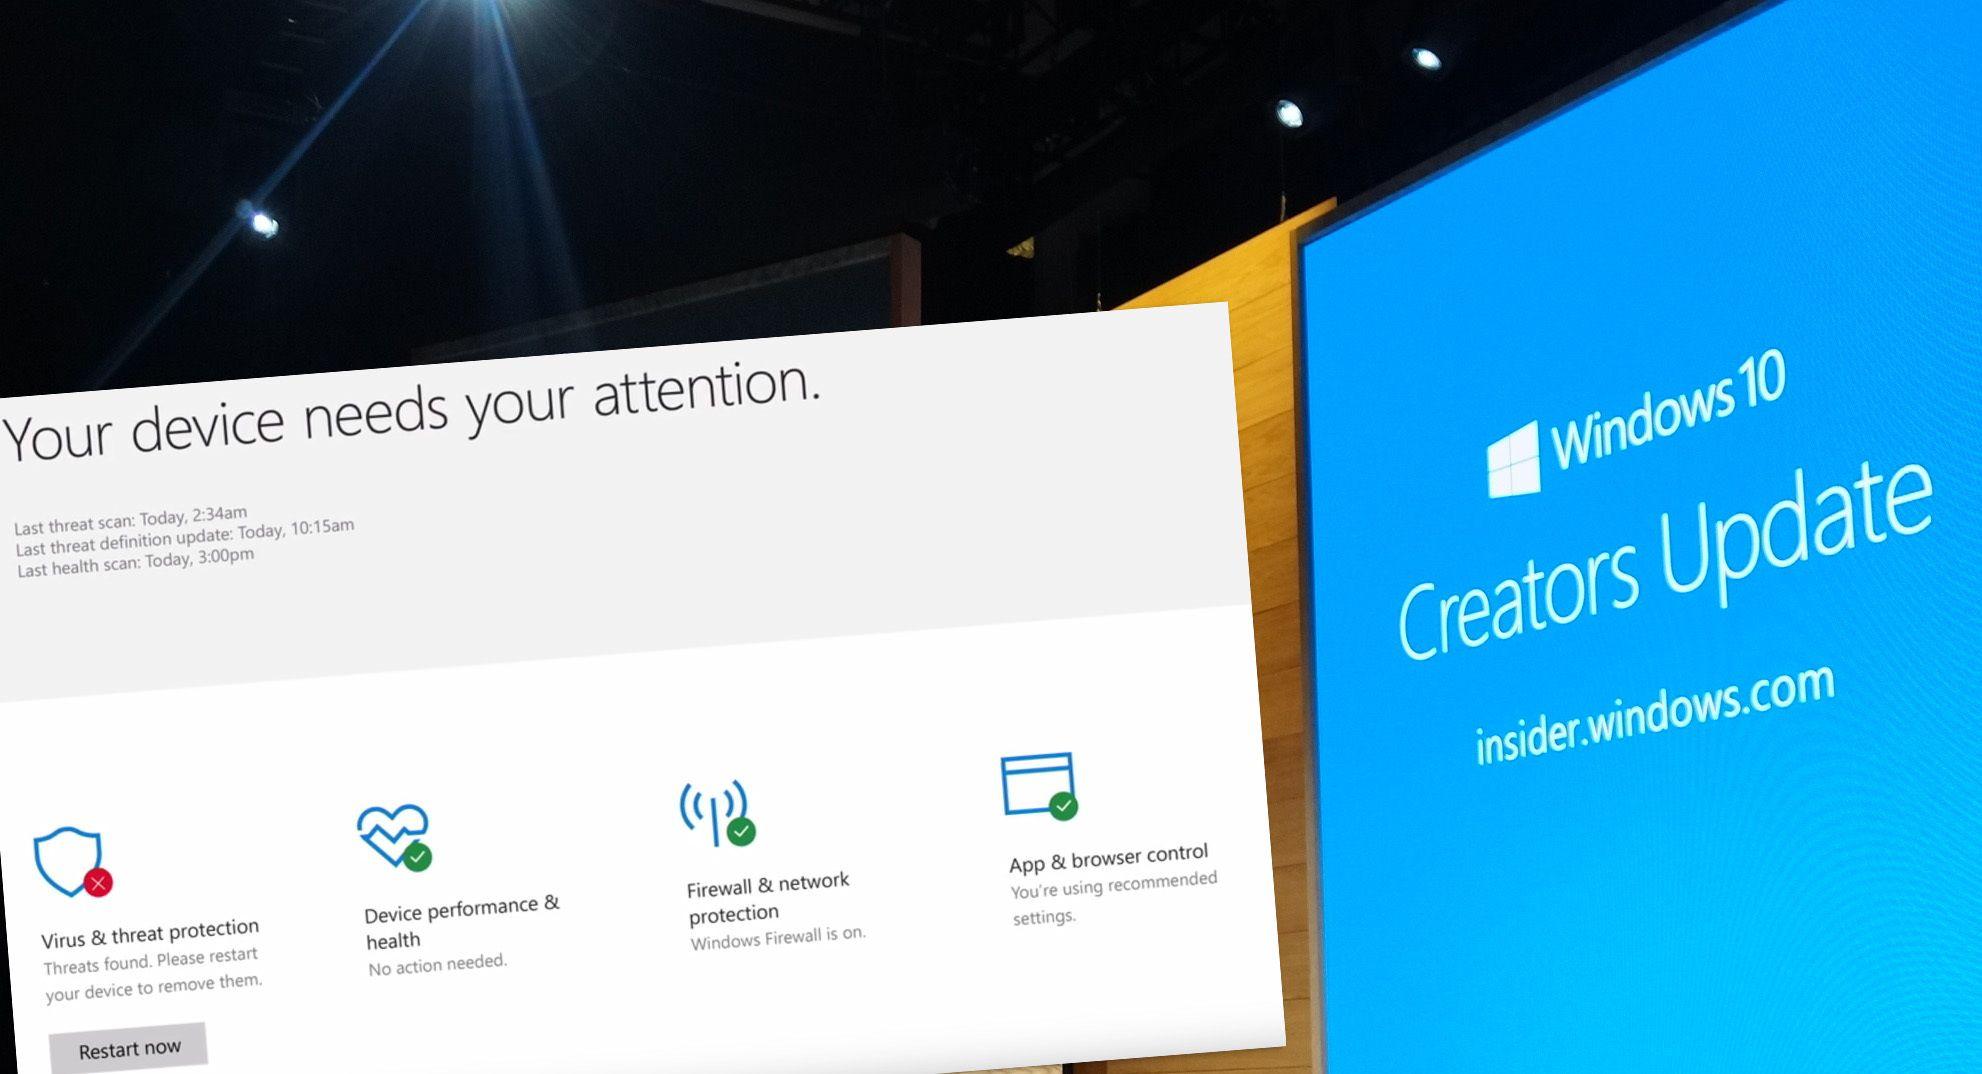 Du kan laste ned Windows 10 Creators Update allerede nå